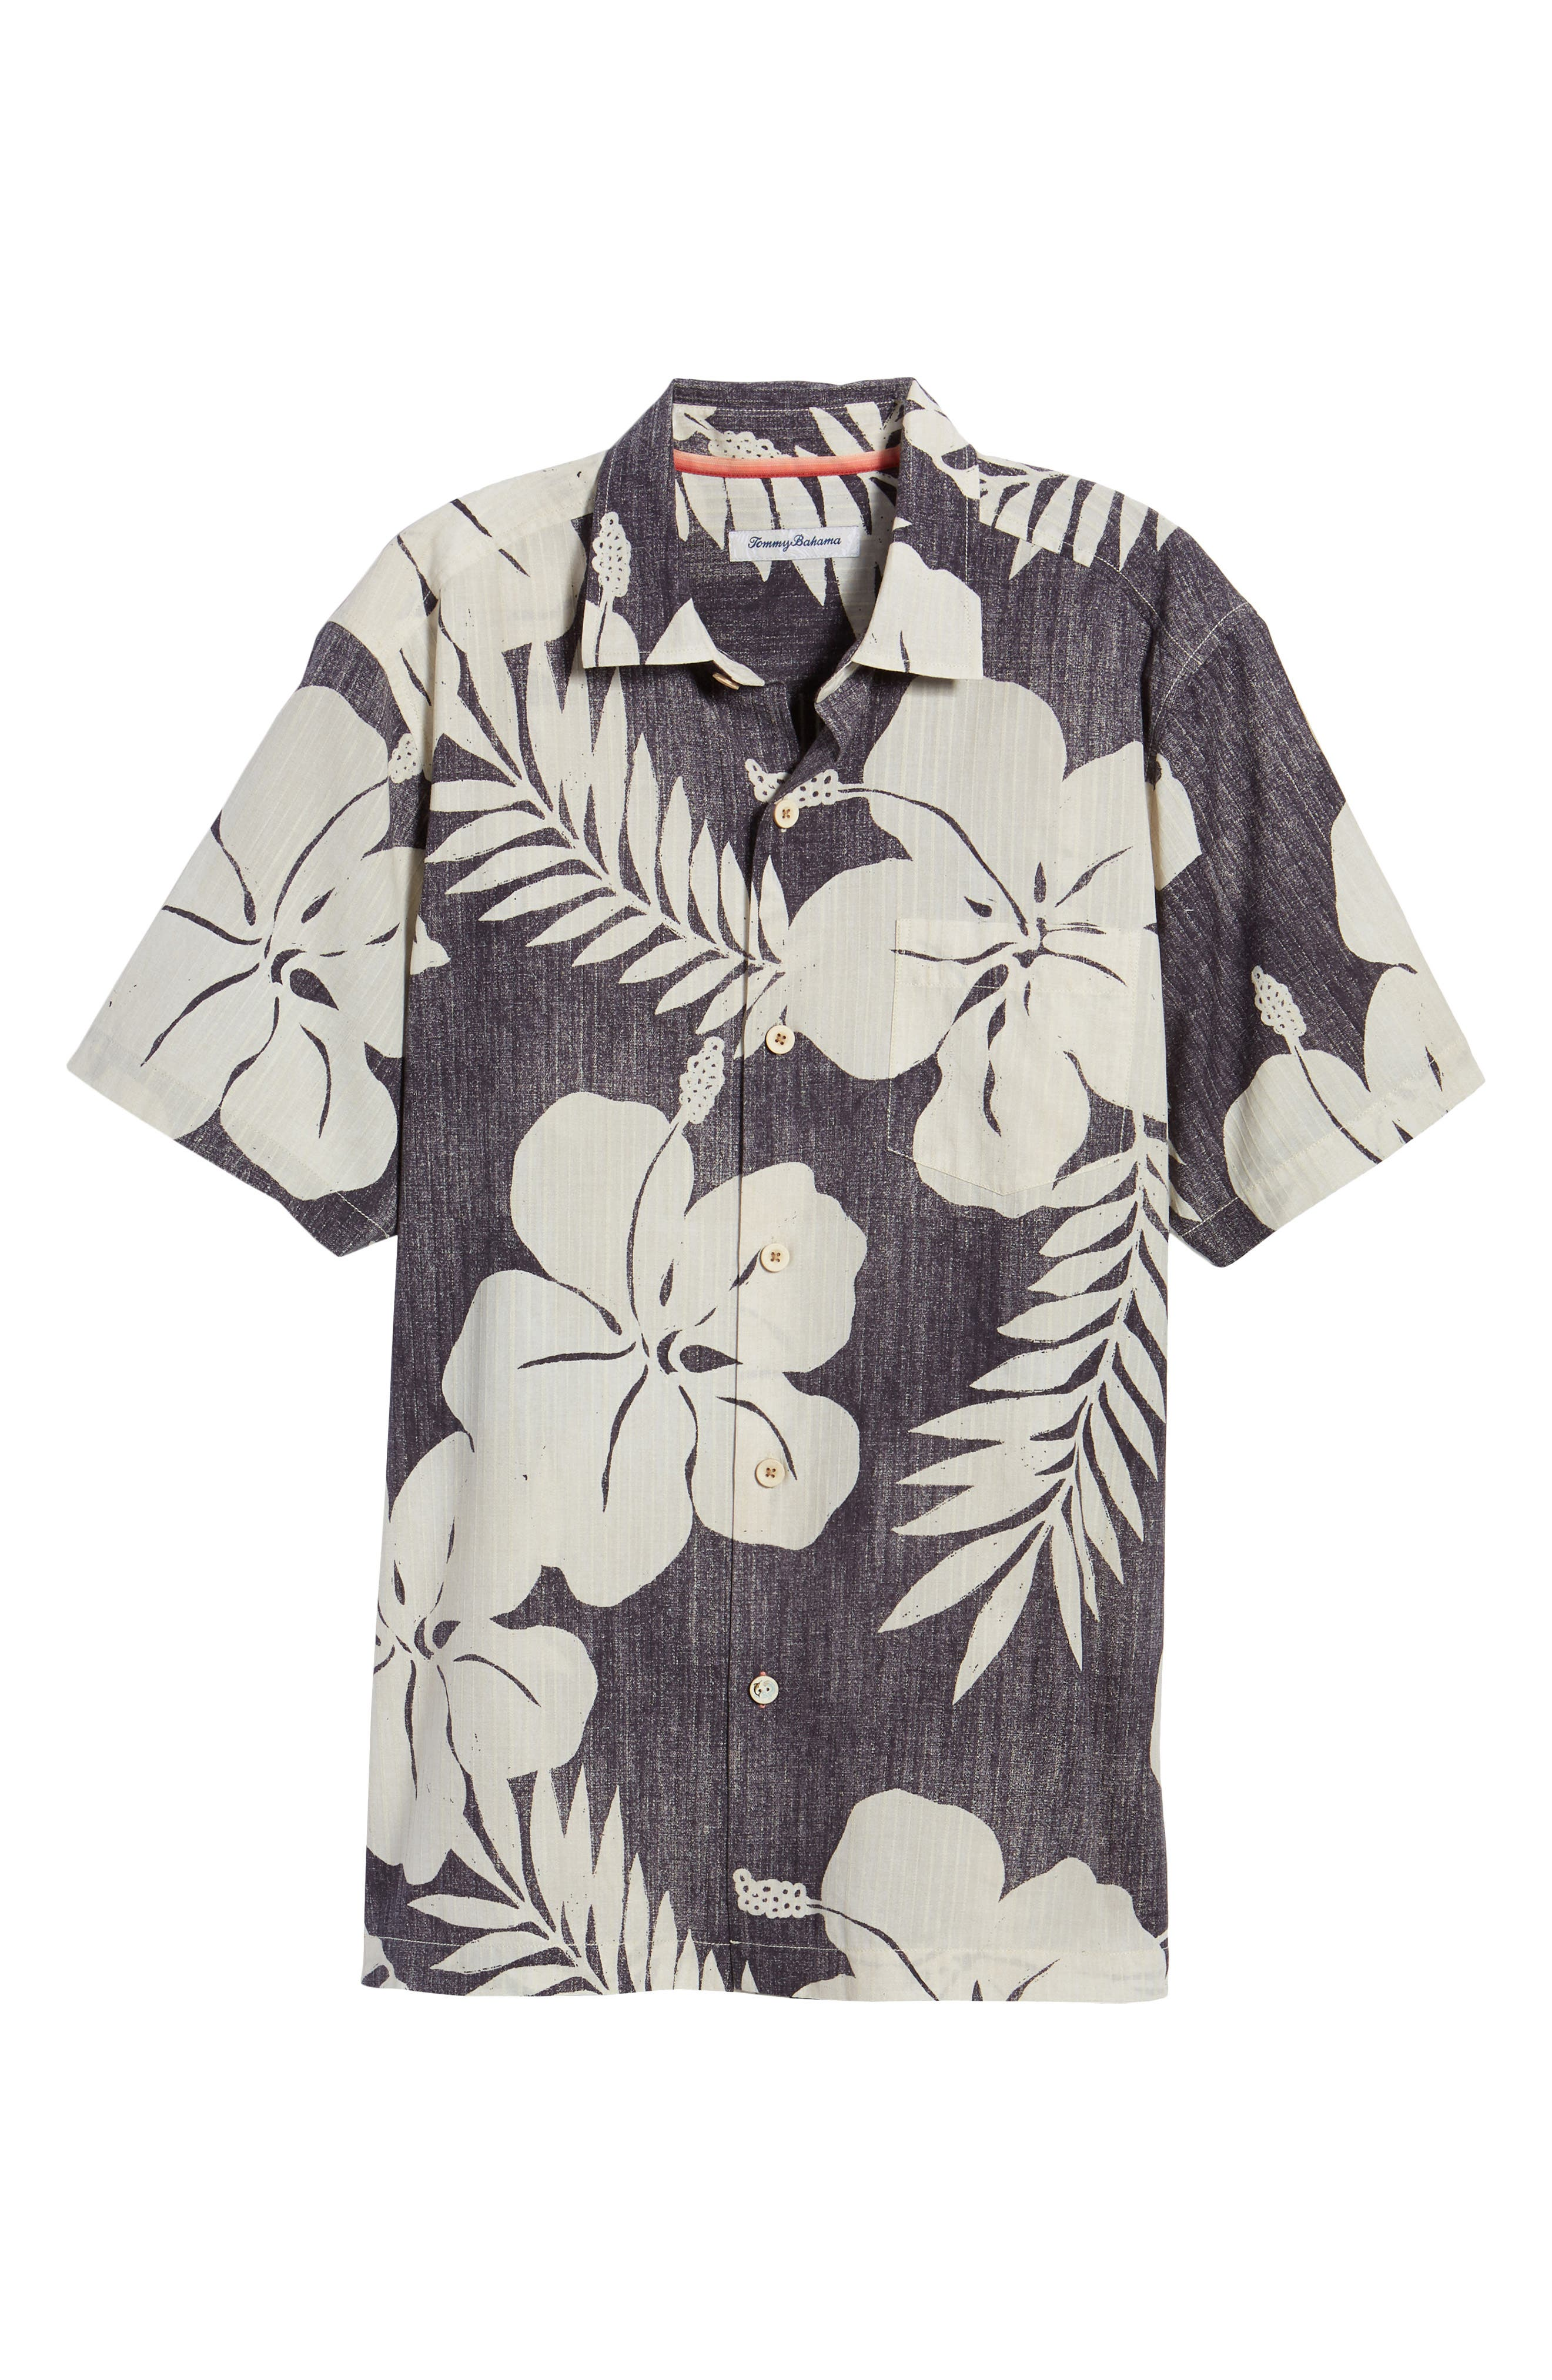 Hialeah Hibiscus Camp Shirt,                             Alternate thumbnail 6, color,                             Steel Wool